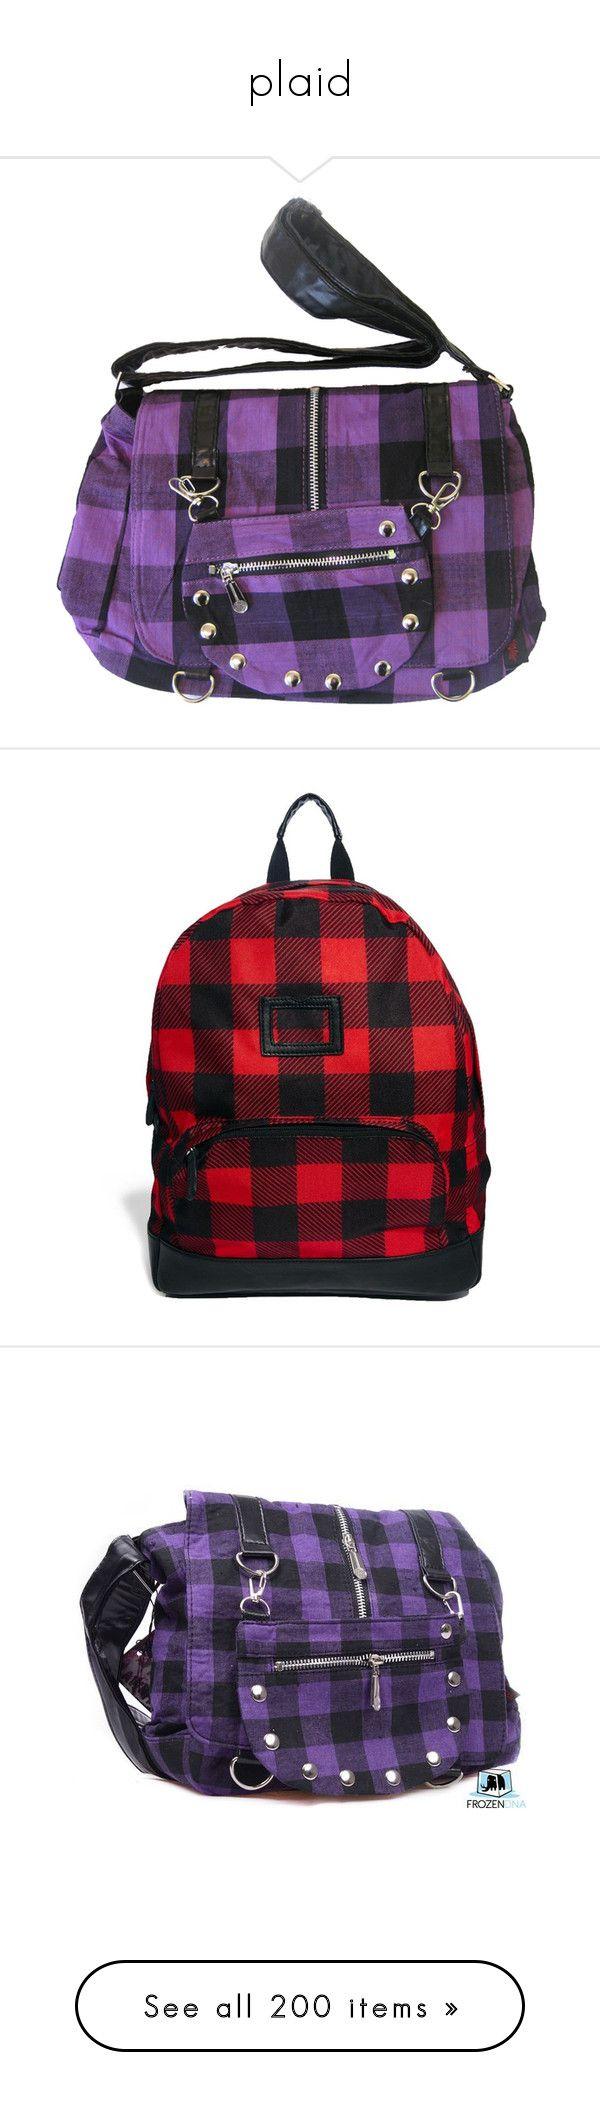 """plaid"" by megsjessd99 ❤ liked on Polyvore featuring bags, handbags, purses, bolsas, handbag purse, man bag, gothic purses, hand bags, purple purse and backpacks"